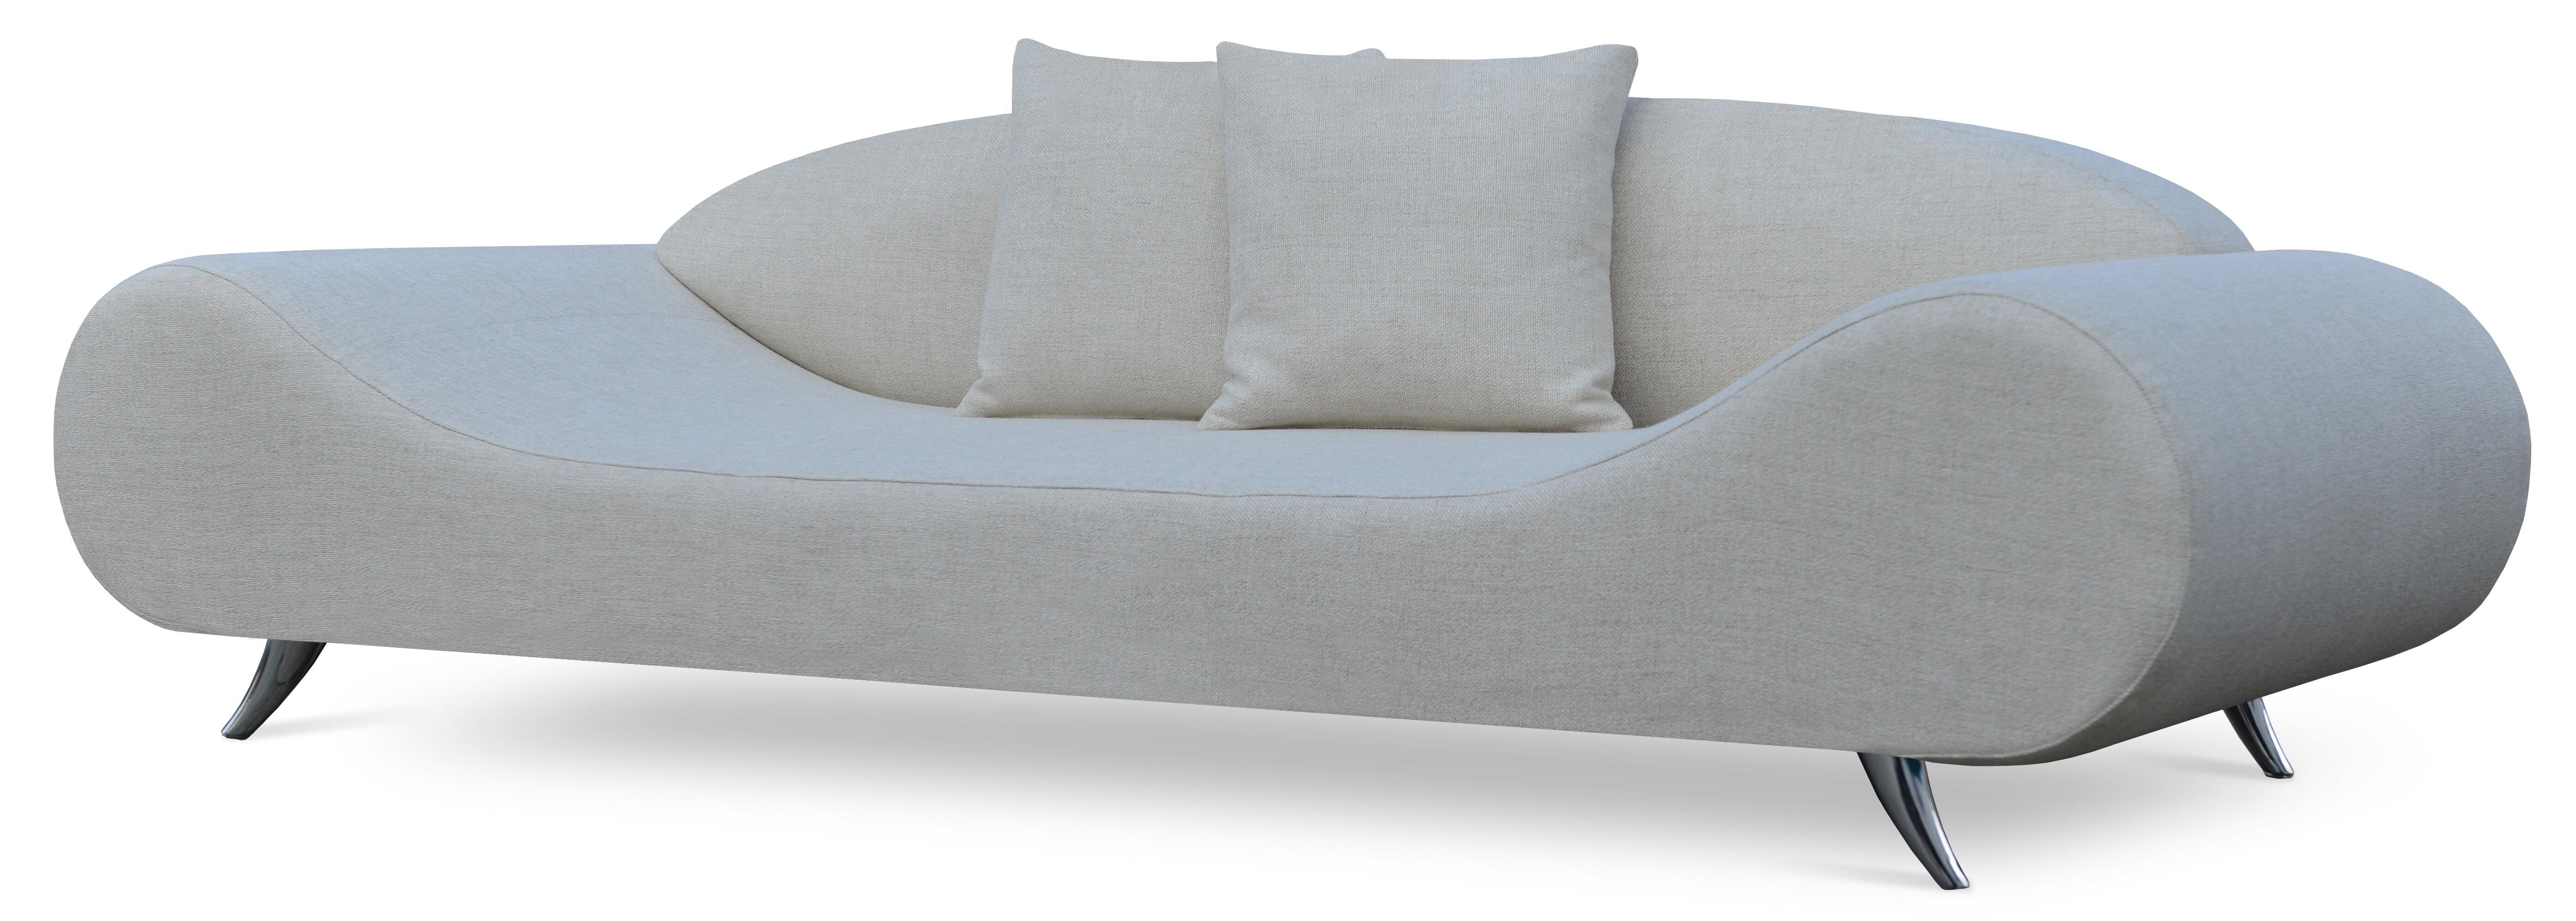 SohoConcept Harmony Sofa   Wayfair